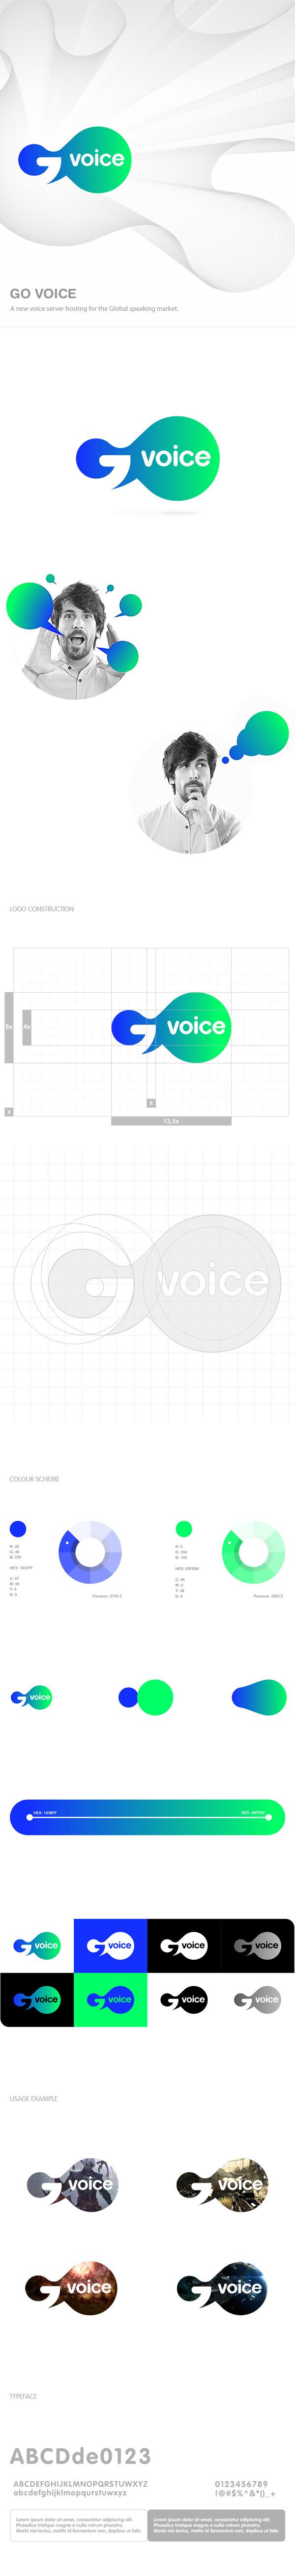 Go Voice #logotype #branding #geometric #grid #brand #logo